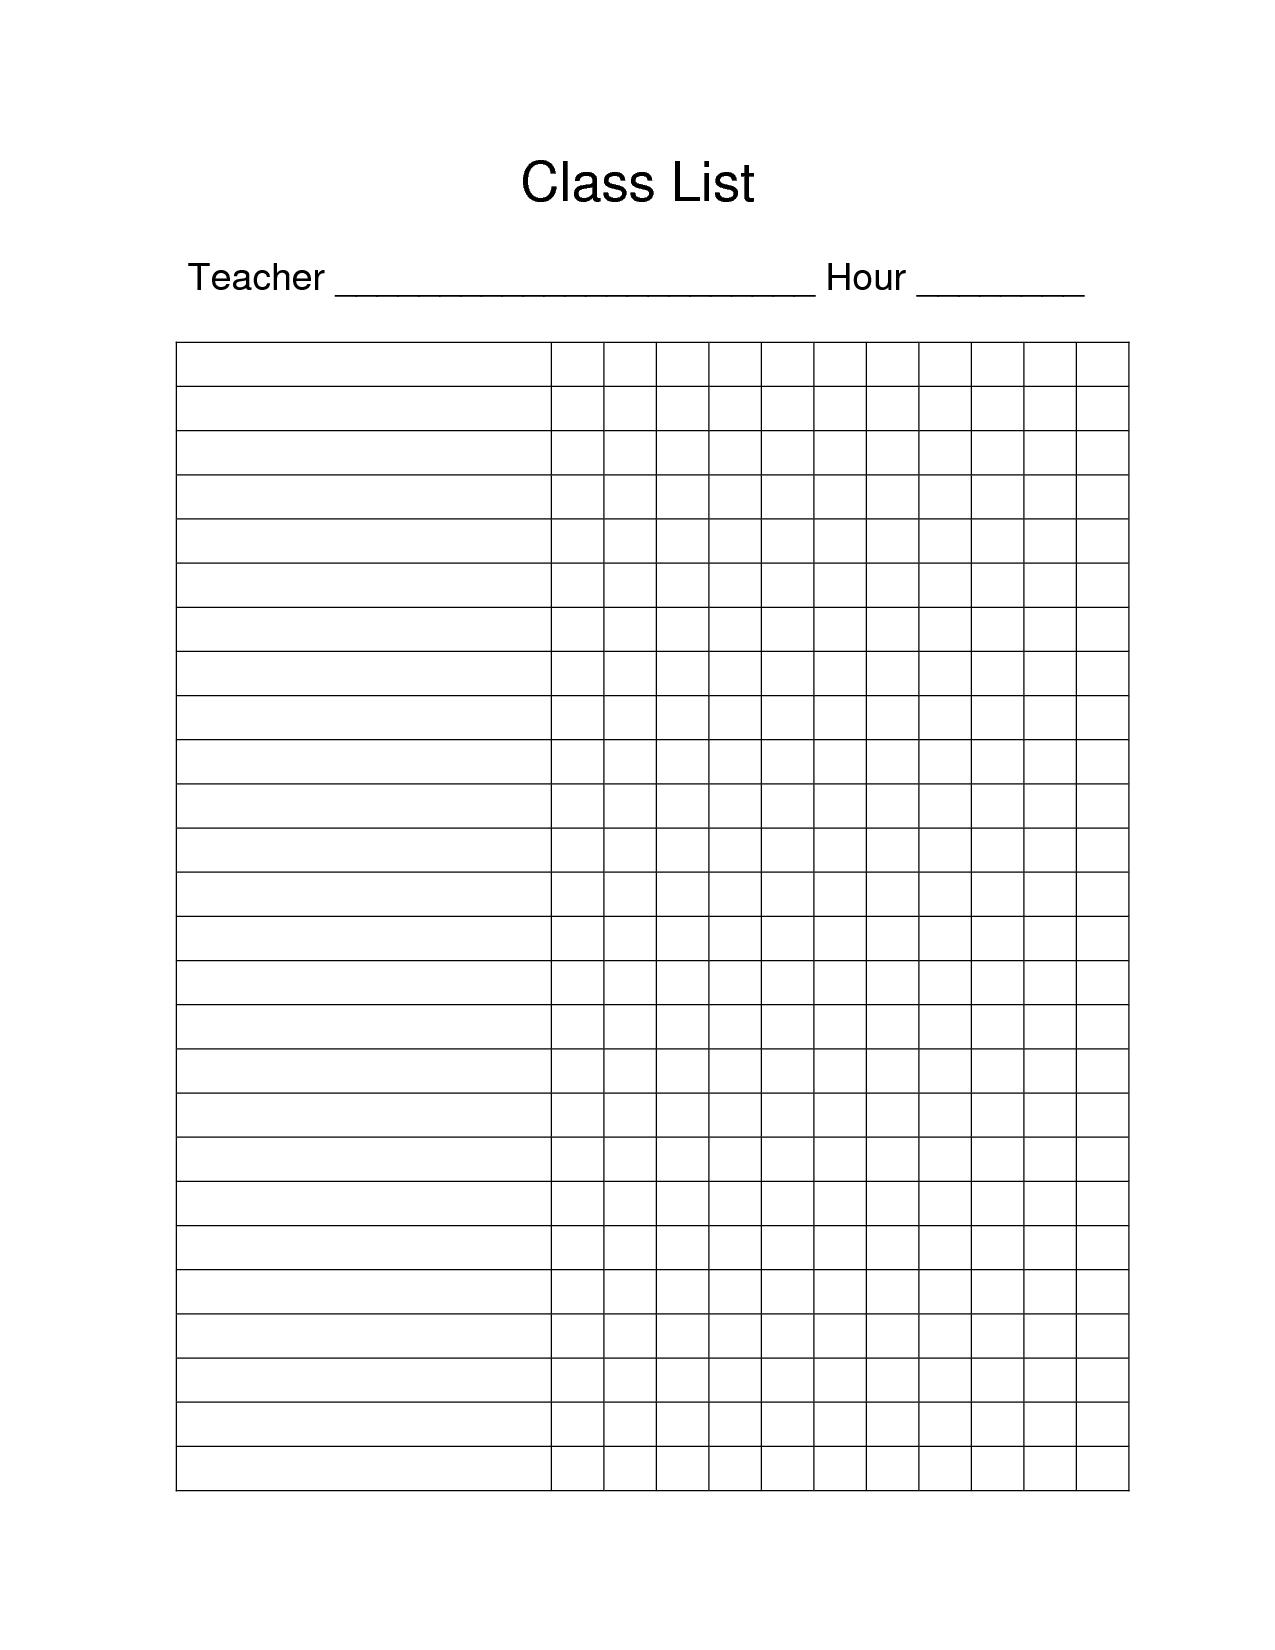 cherub class a pdf free